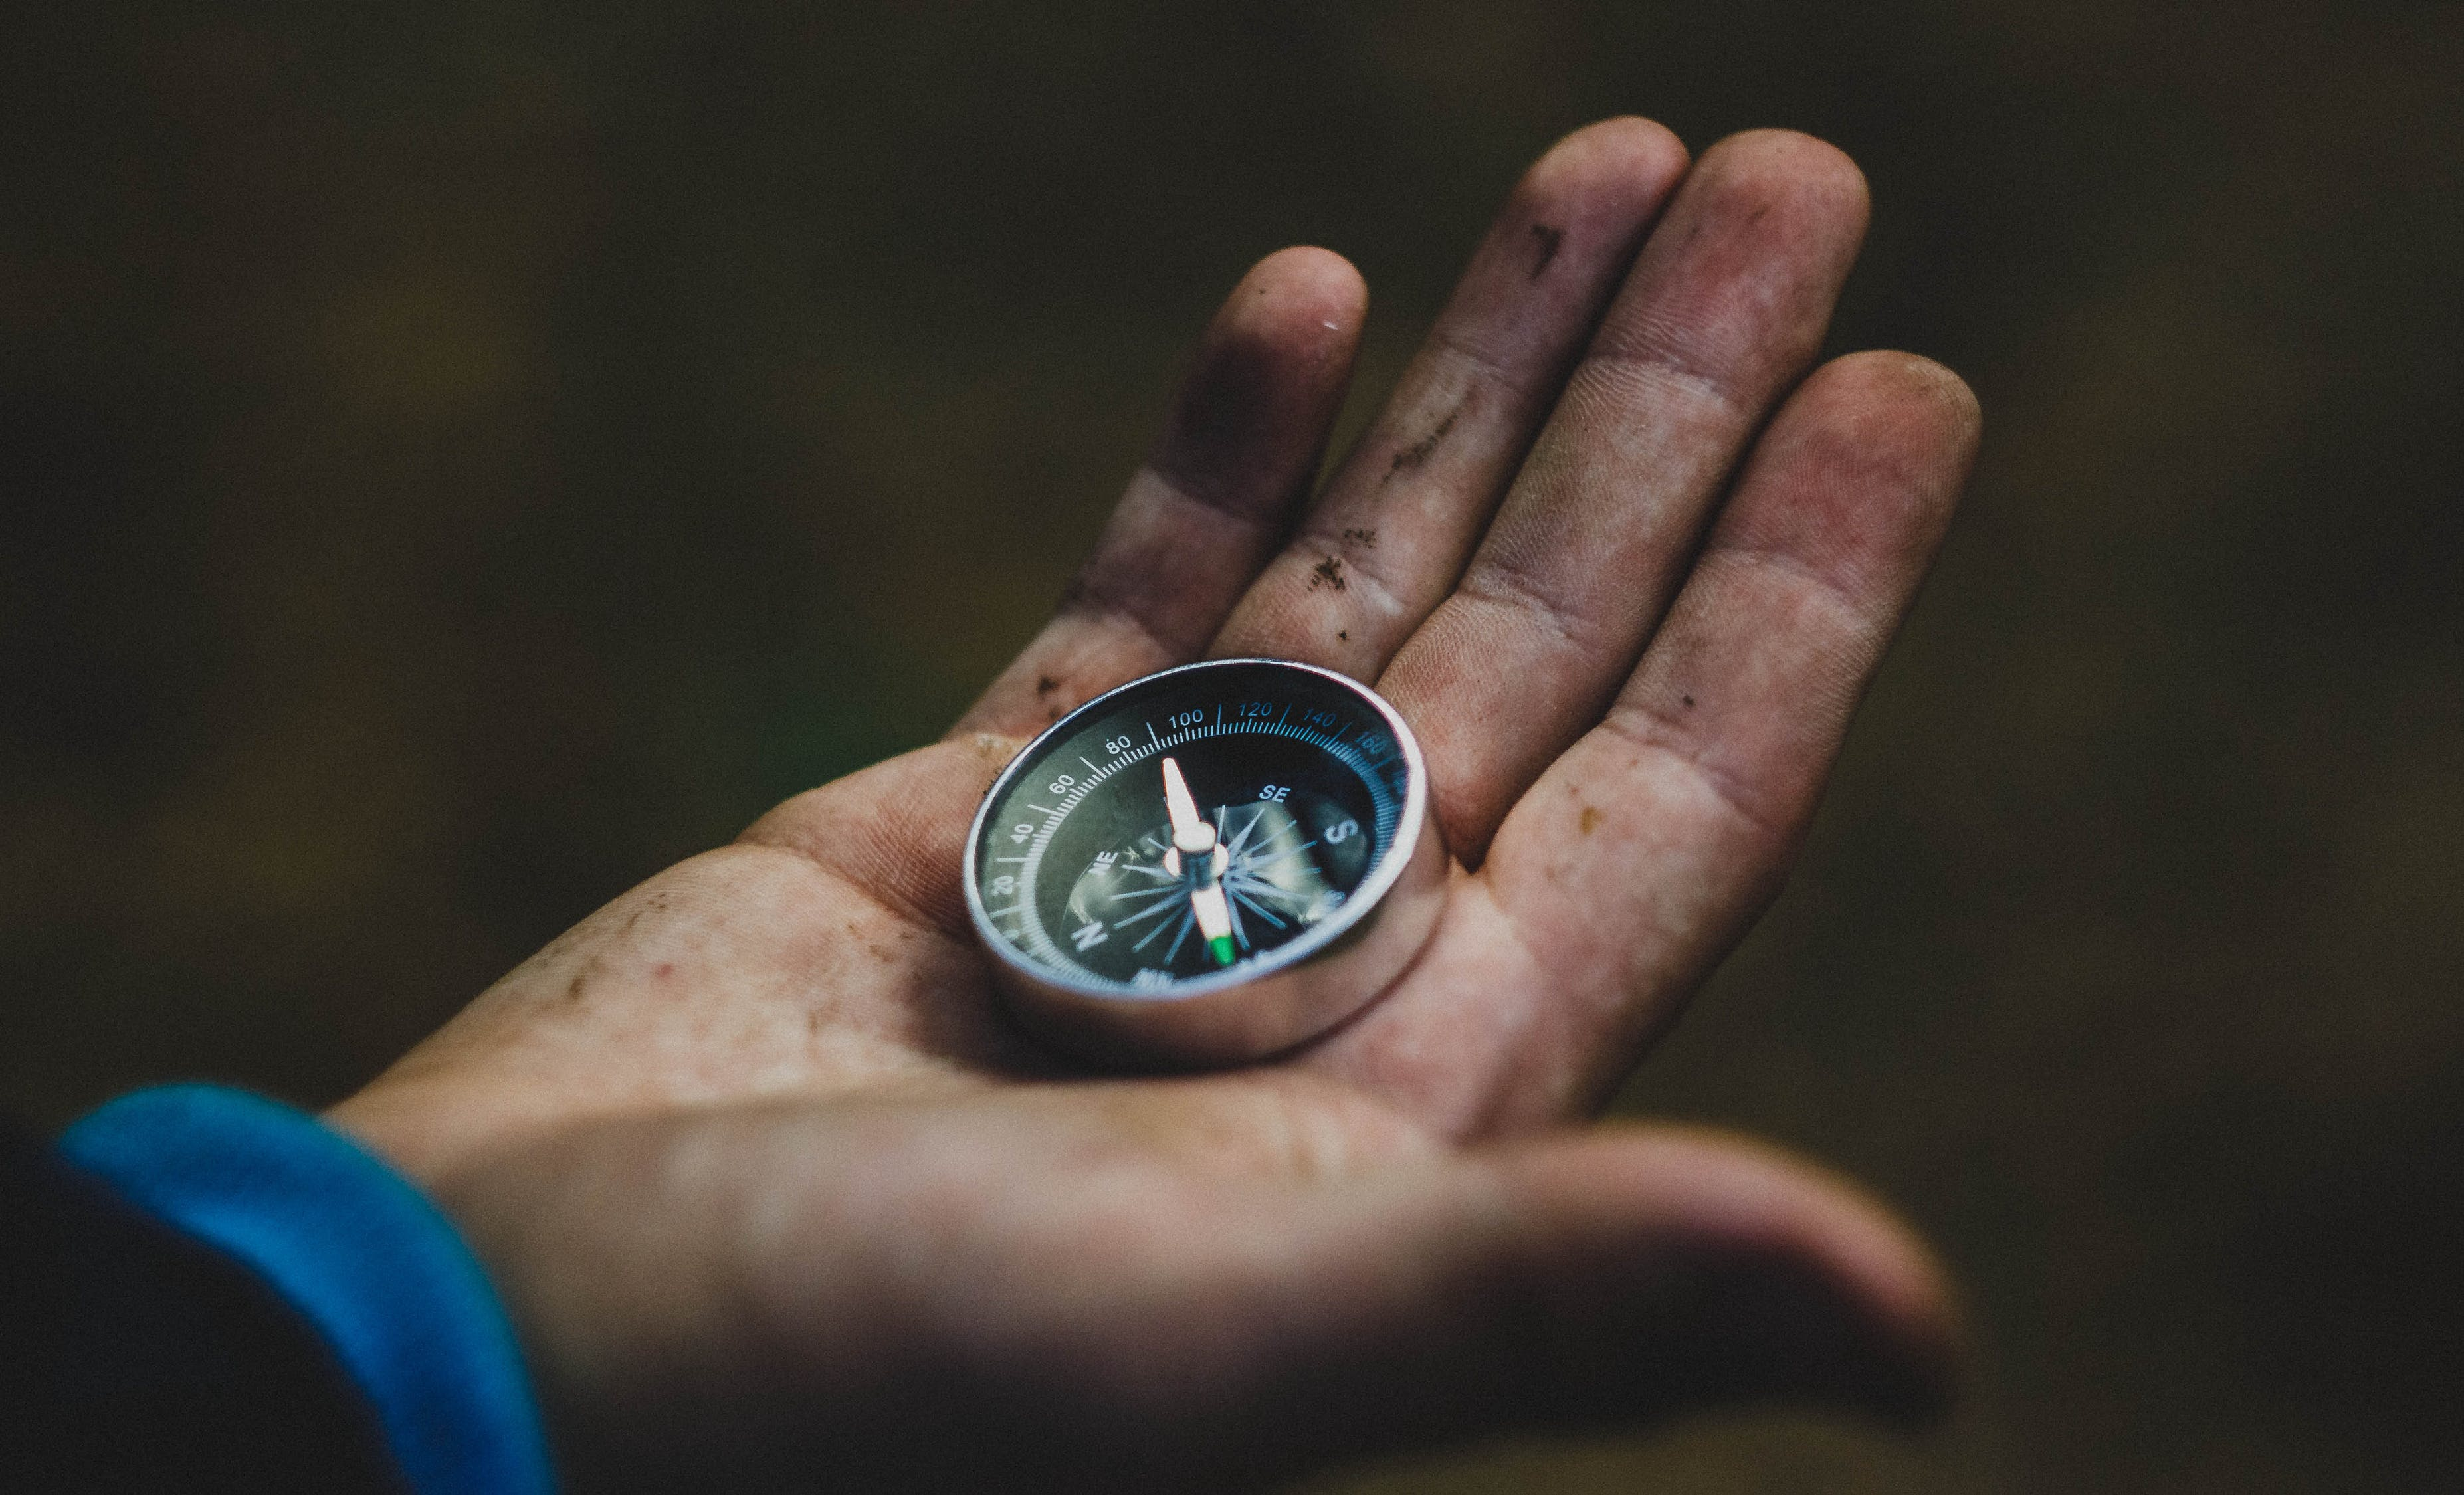 Orang Yang Memegang Kompas Abu Abu Dan Hitam